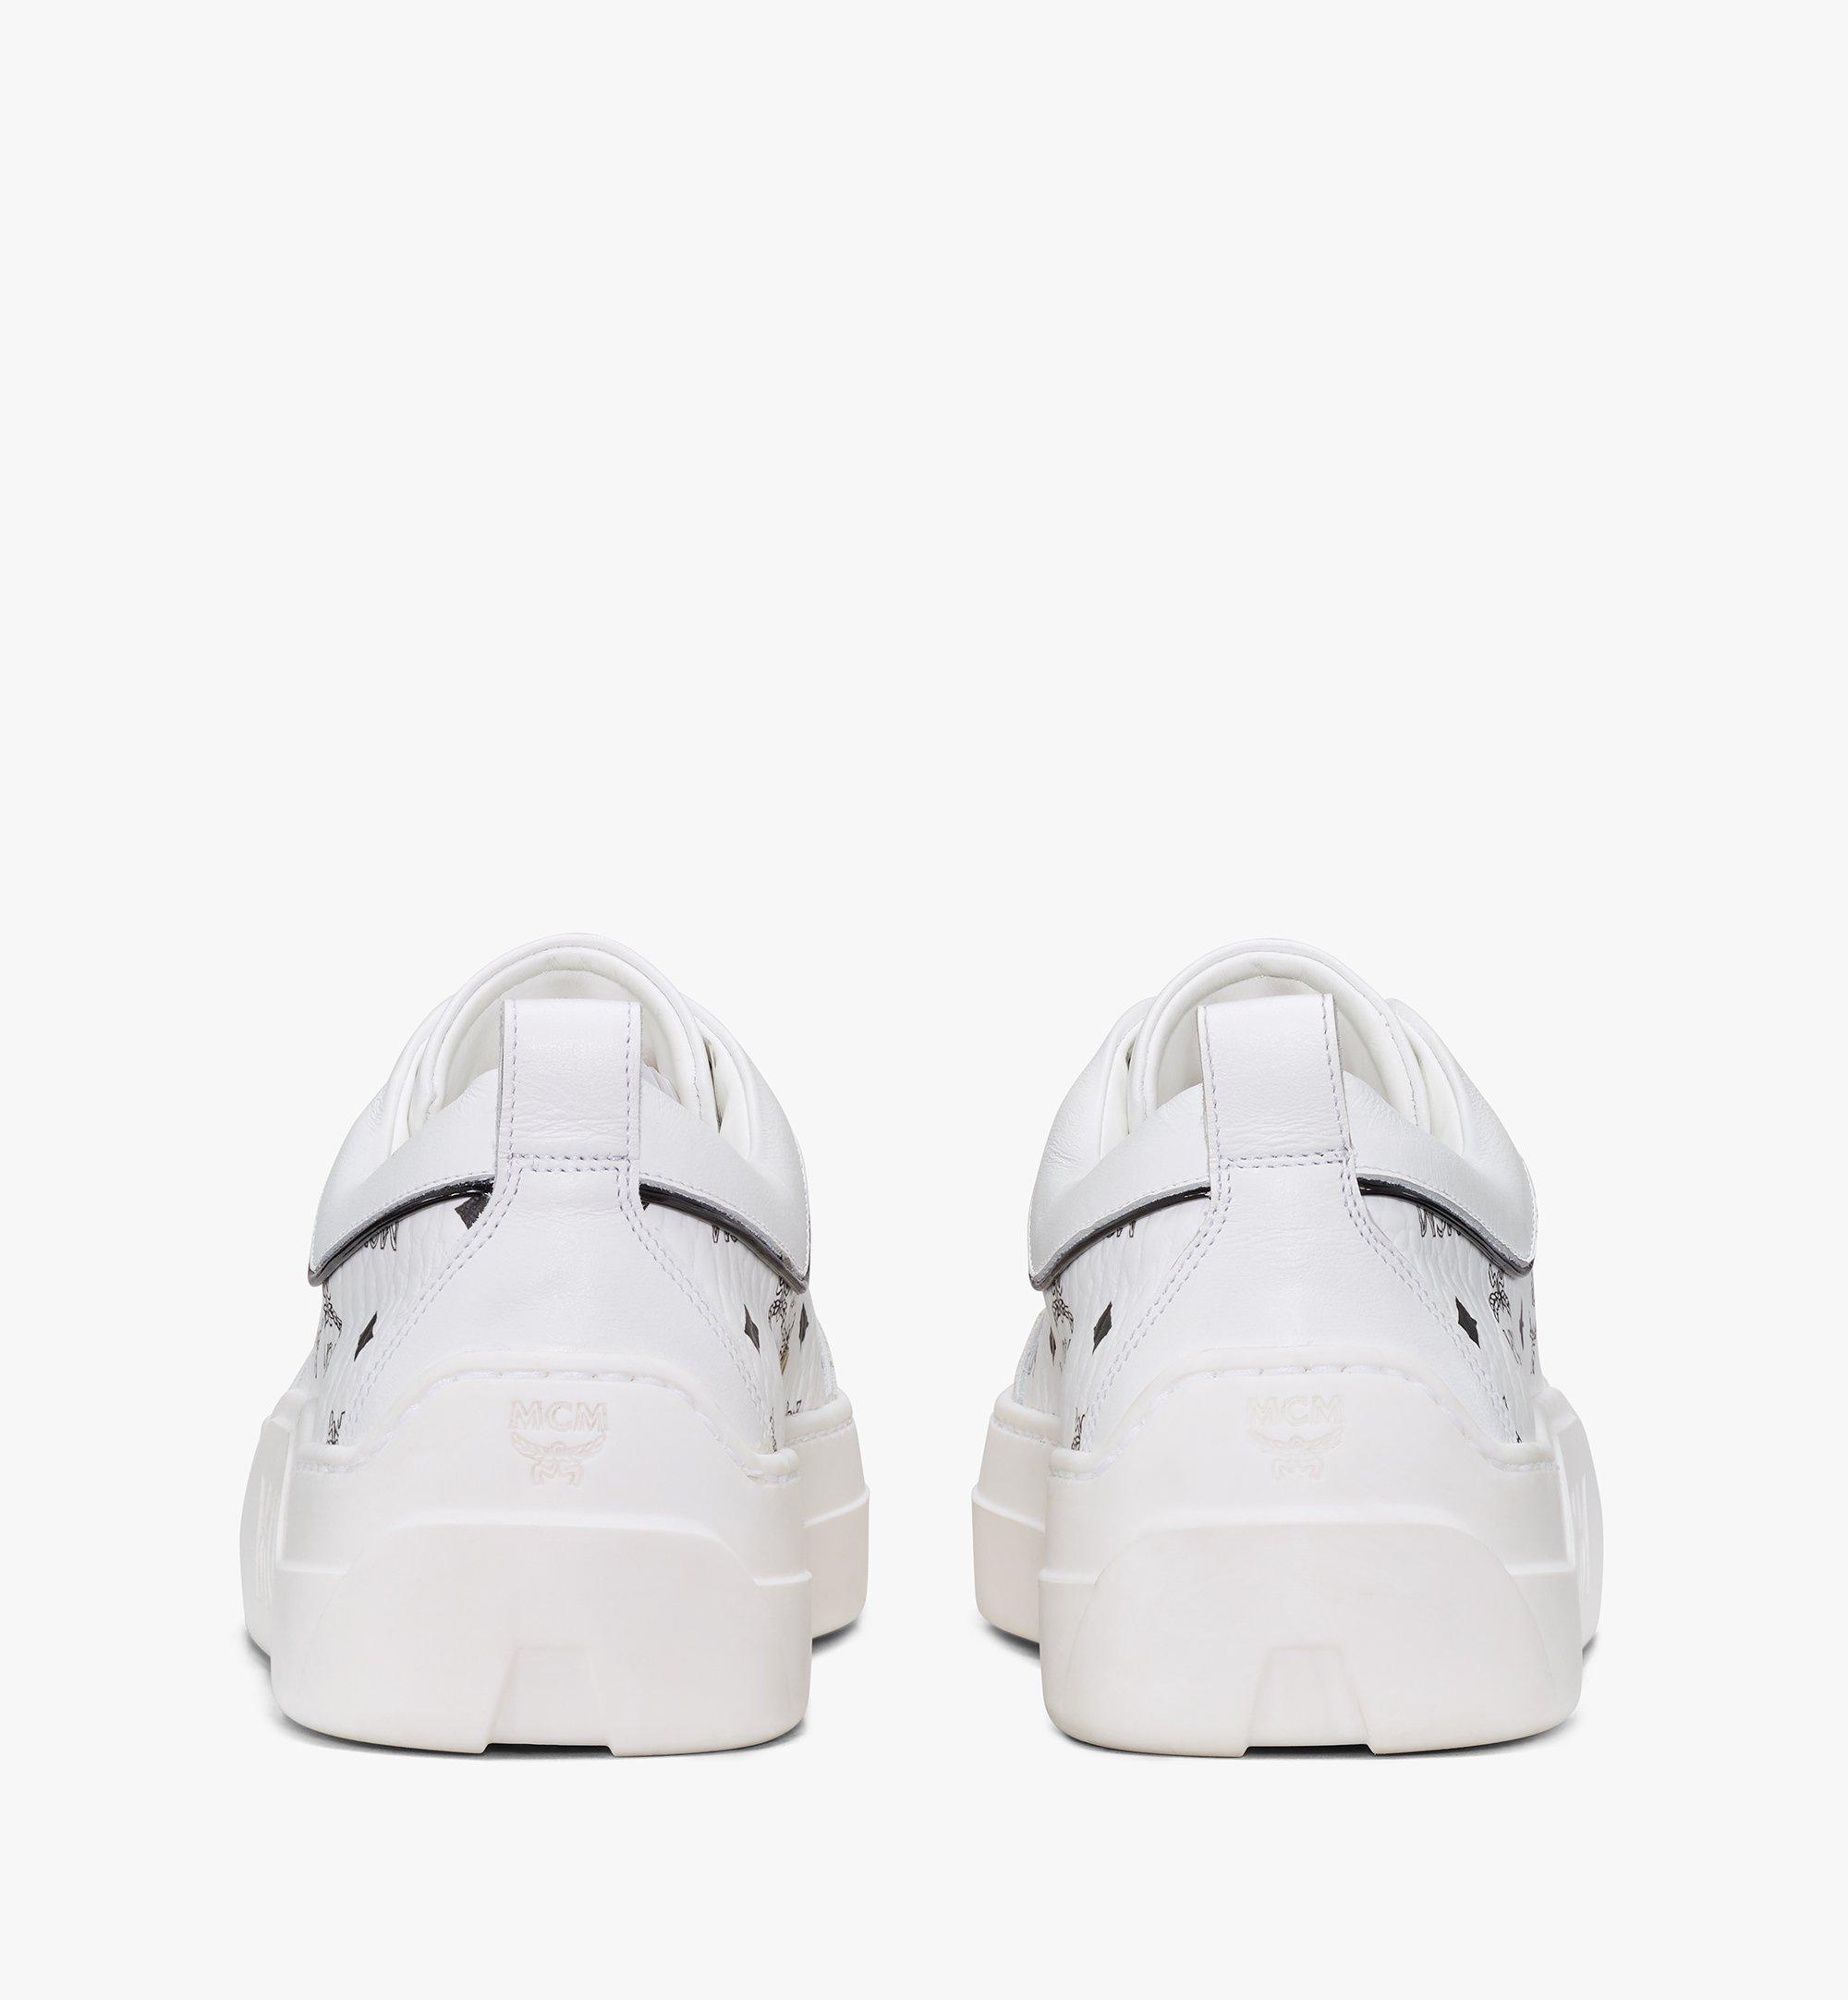 MCM Women's Skyward Platform Sneakers in Visetos White MESAAMM19WT039 Alternate View 2